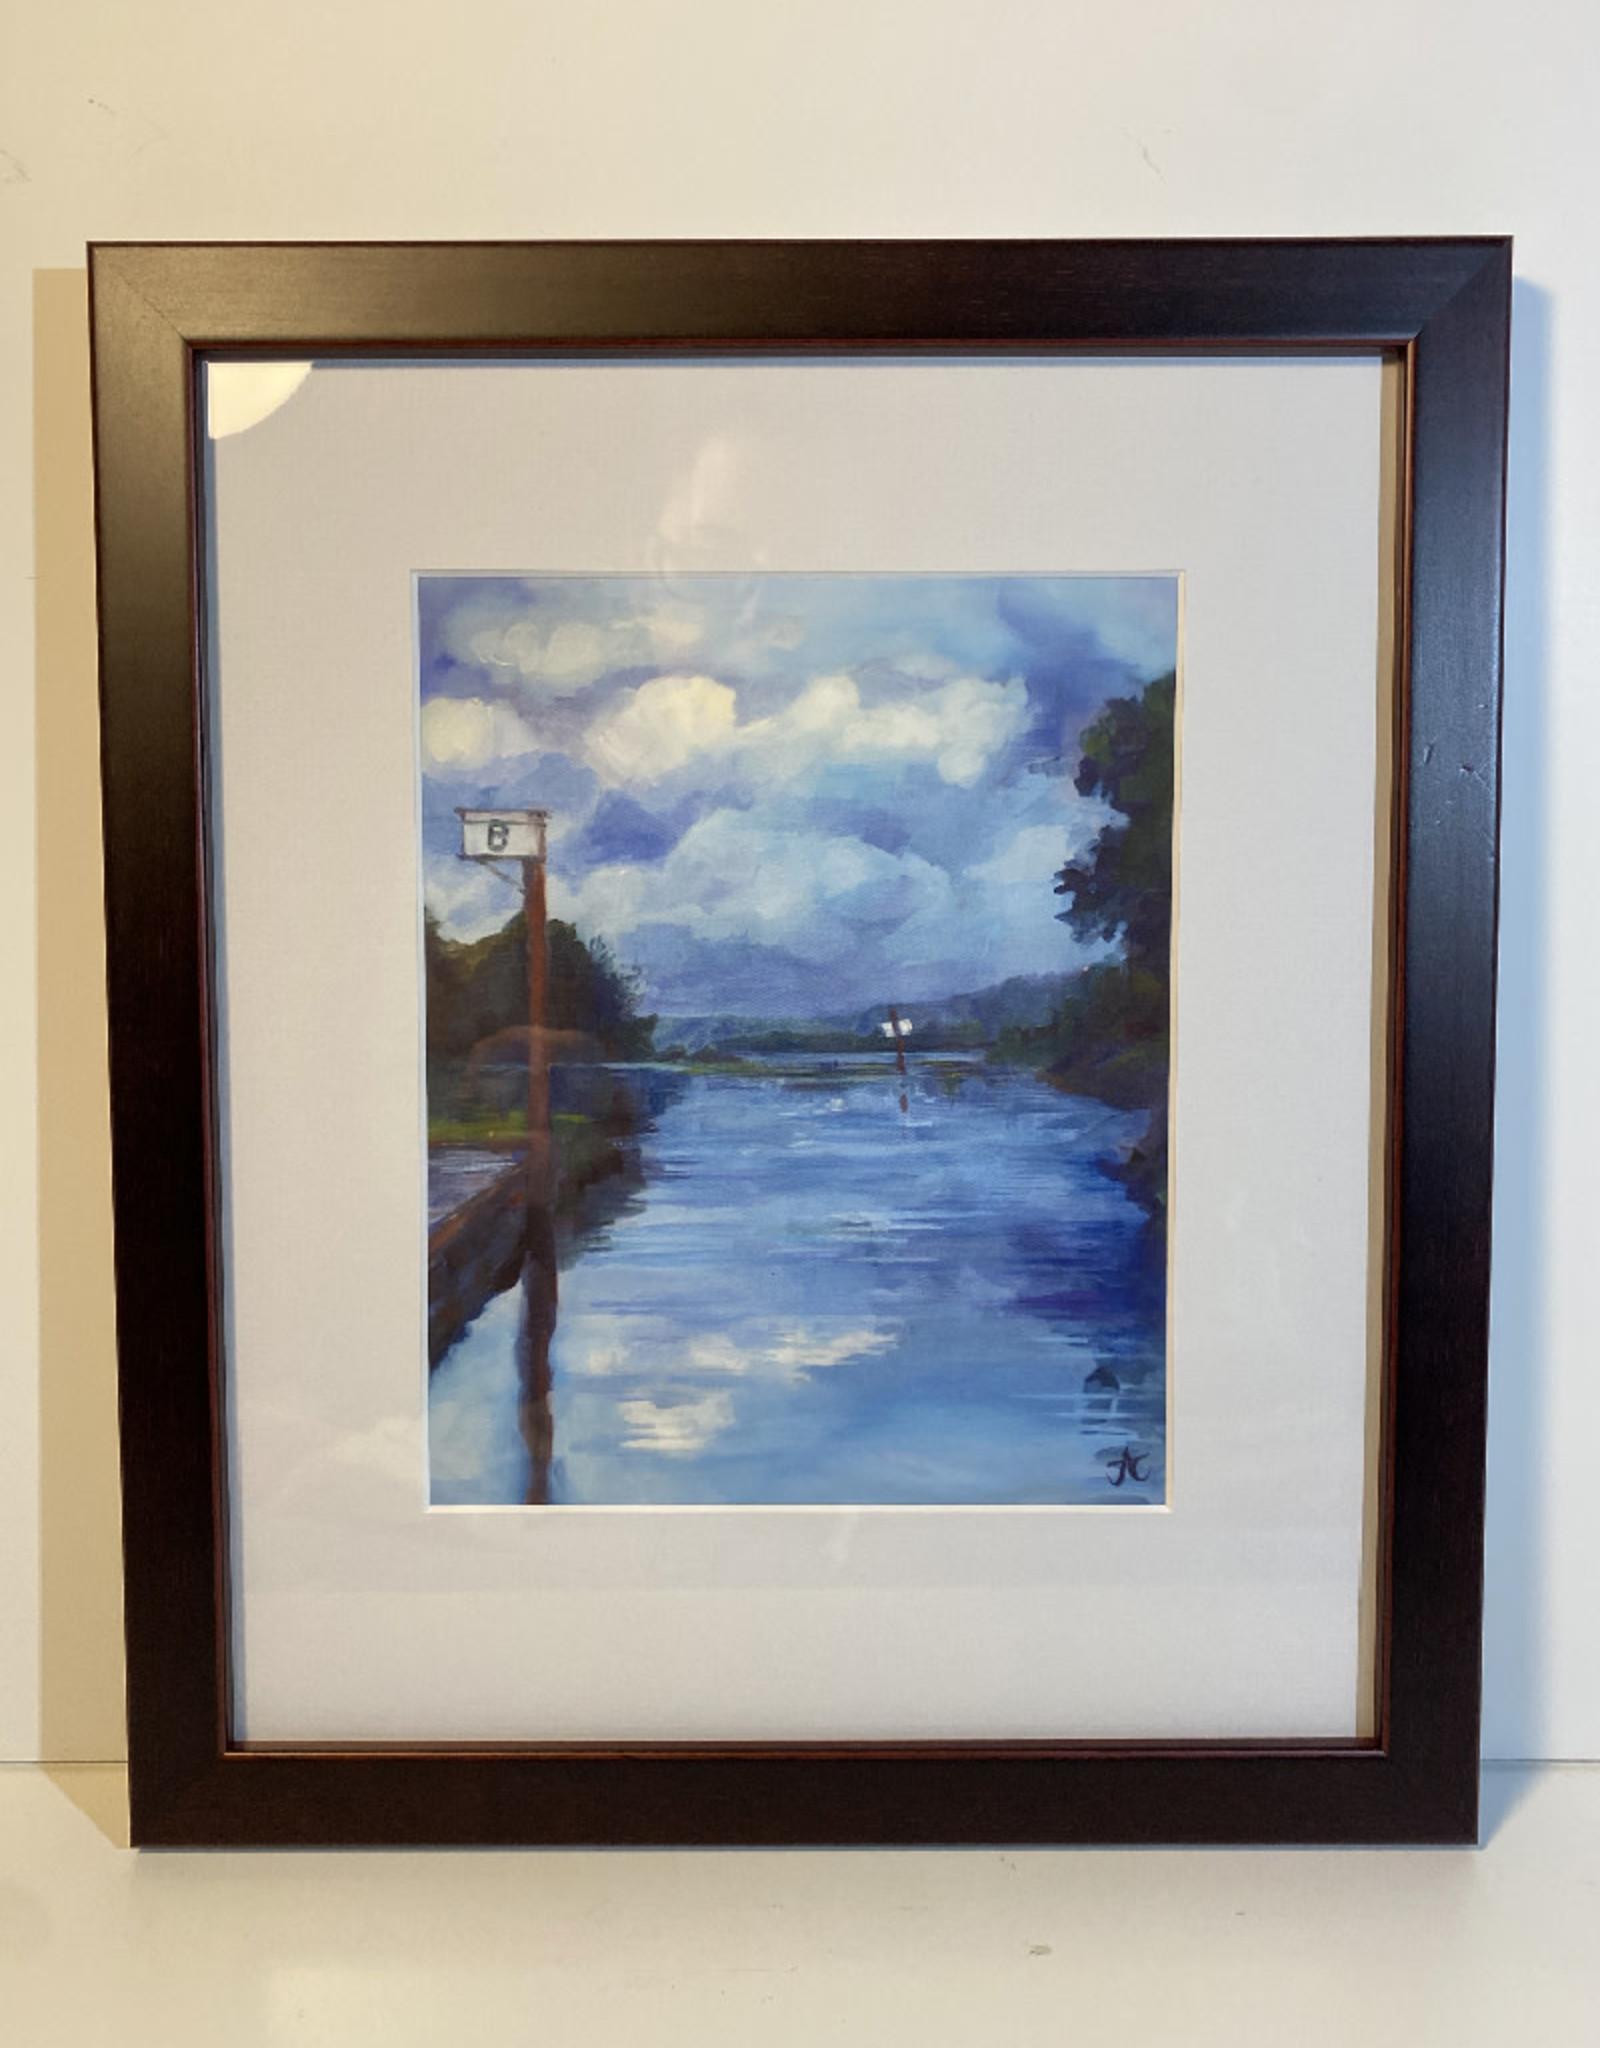 "Jennifer Cook-Chrysos Chrysos Designs Artwork, archival print, ""Willow Bar"", 6.5 x 8, matted, art frame"